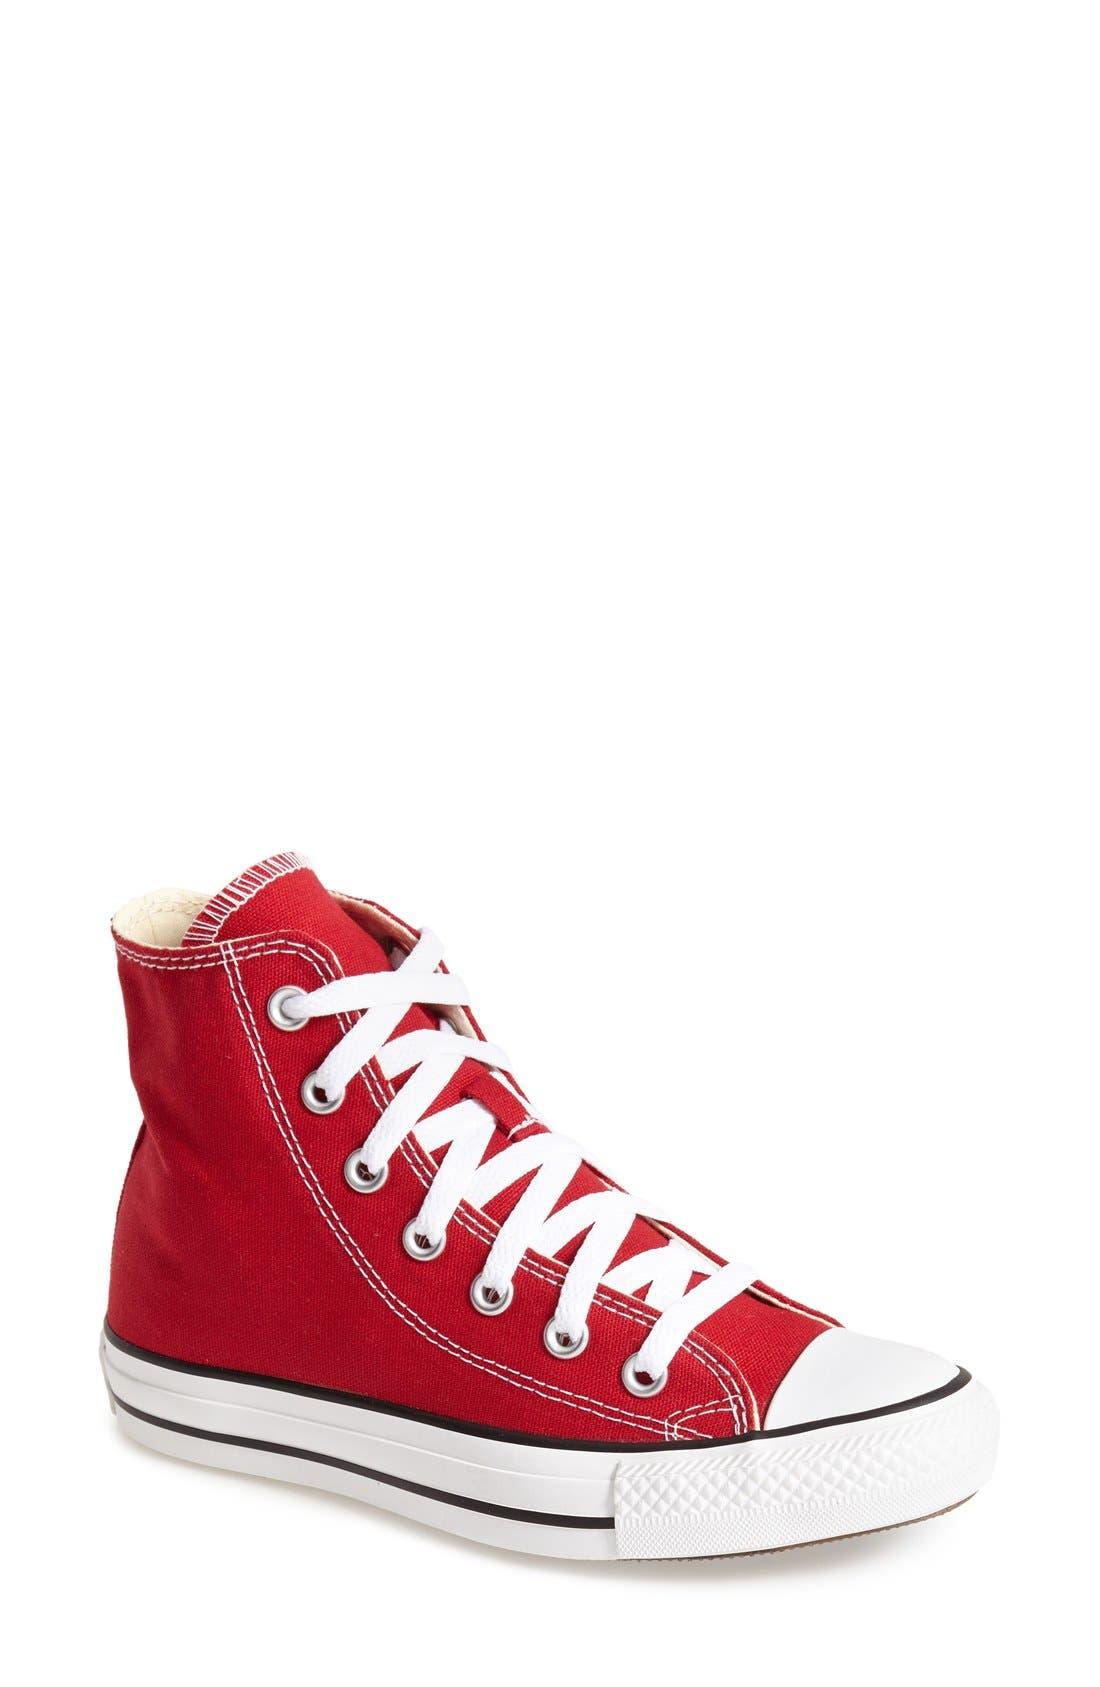 Alternate Image 1 Selected - Converse Chuck Taylor® All Star® 'Seasonal' High Top Sneaker (Women)